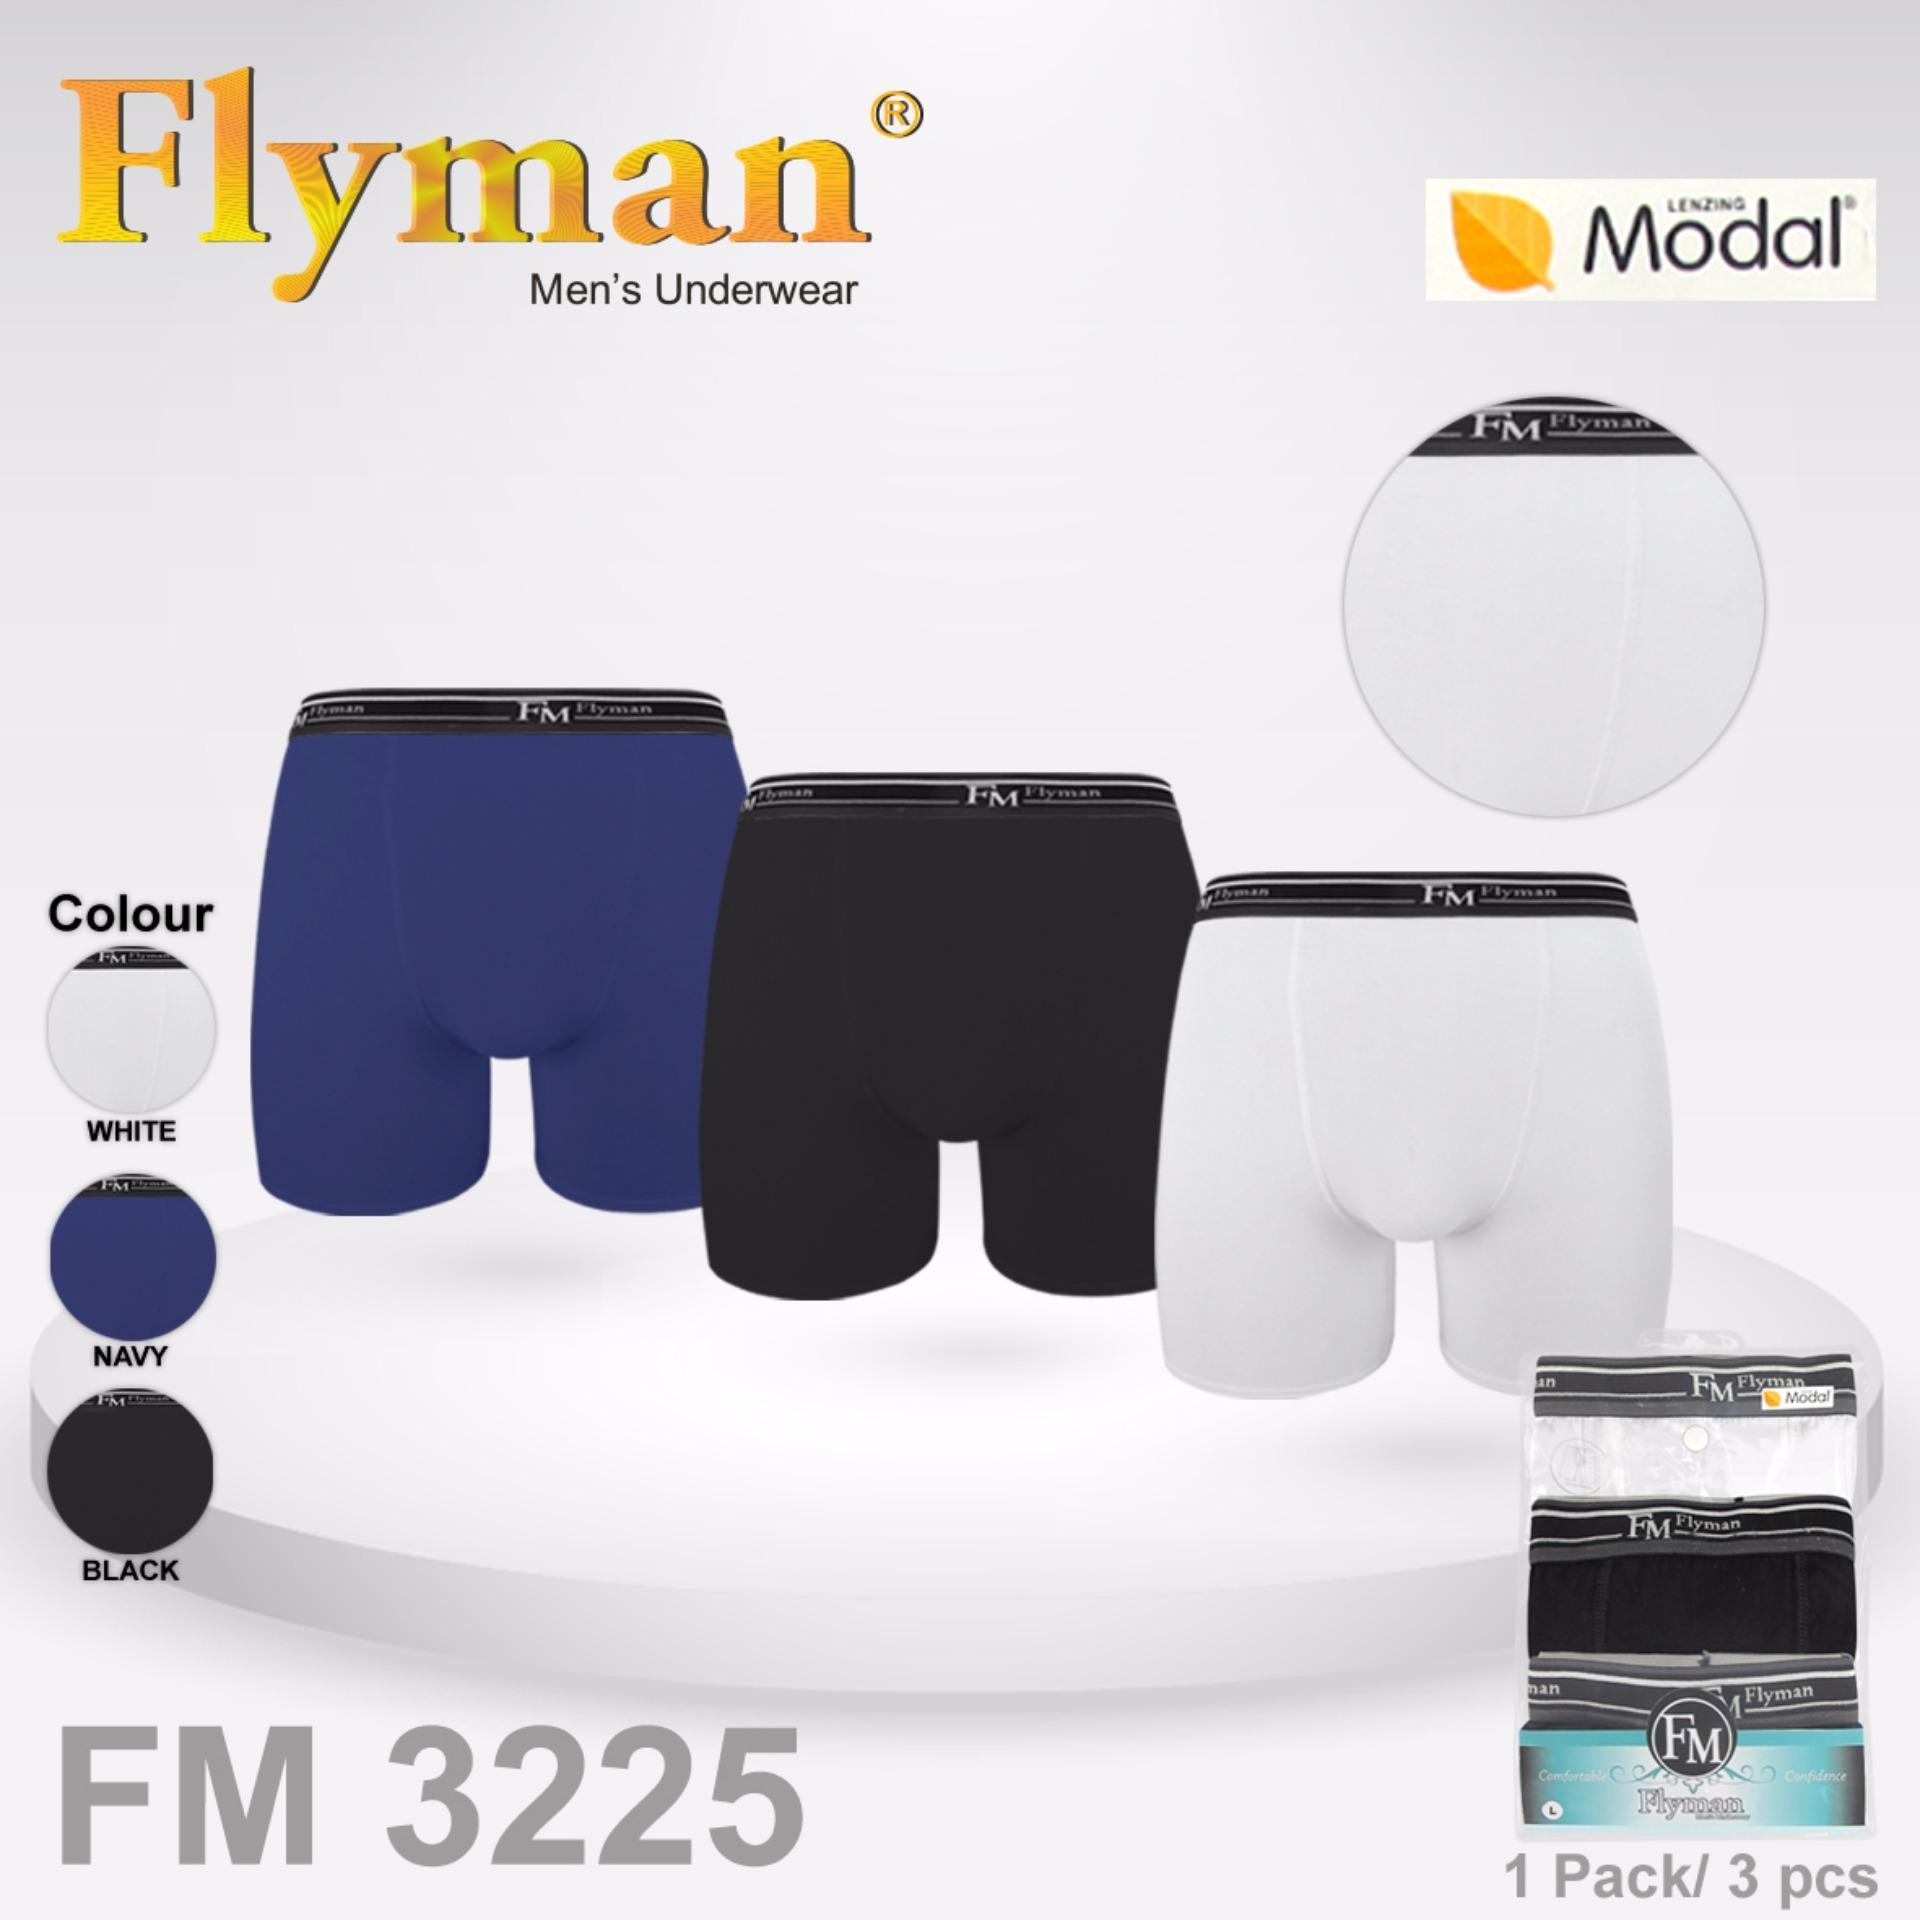 Jual Flyman Long Boxer Pria Dewasa 1 Pack 3 Pcs Fm 3225 Murah Di Dki Jakarta